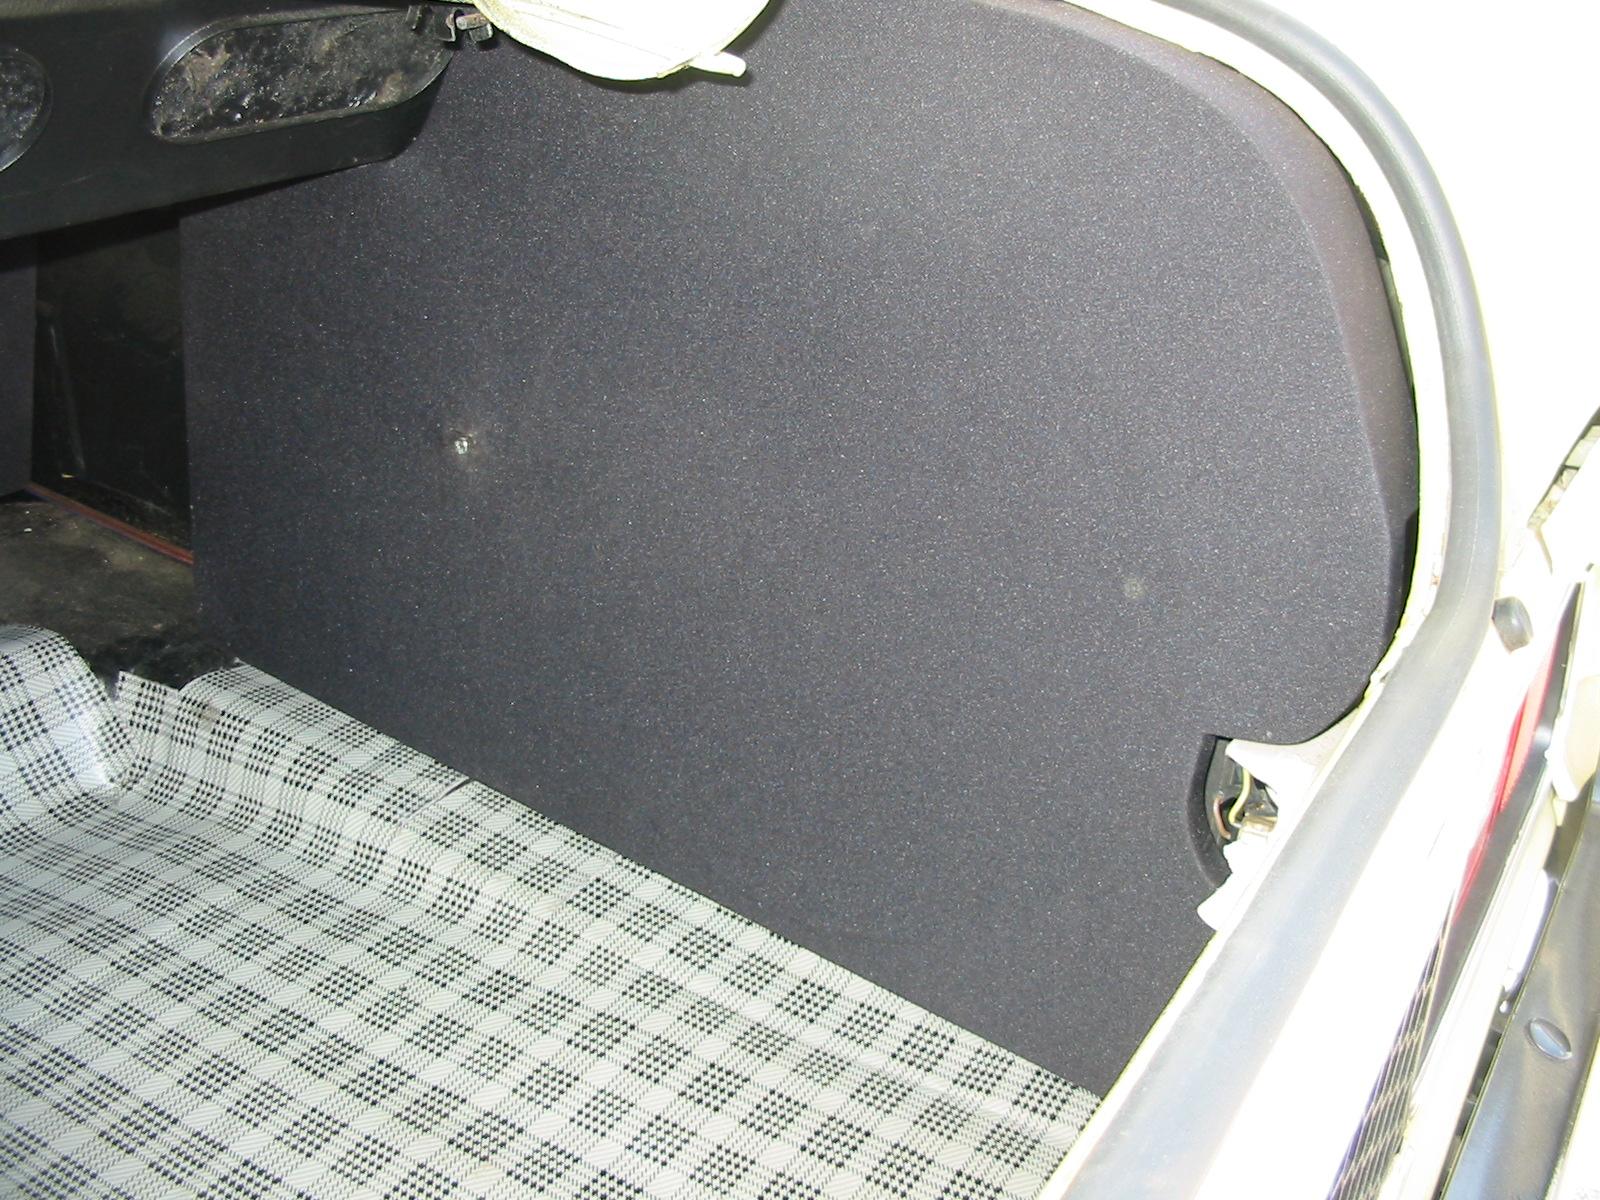 Subwoofer versteckt hinter Akustikstoff